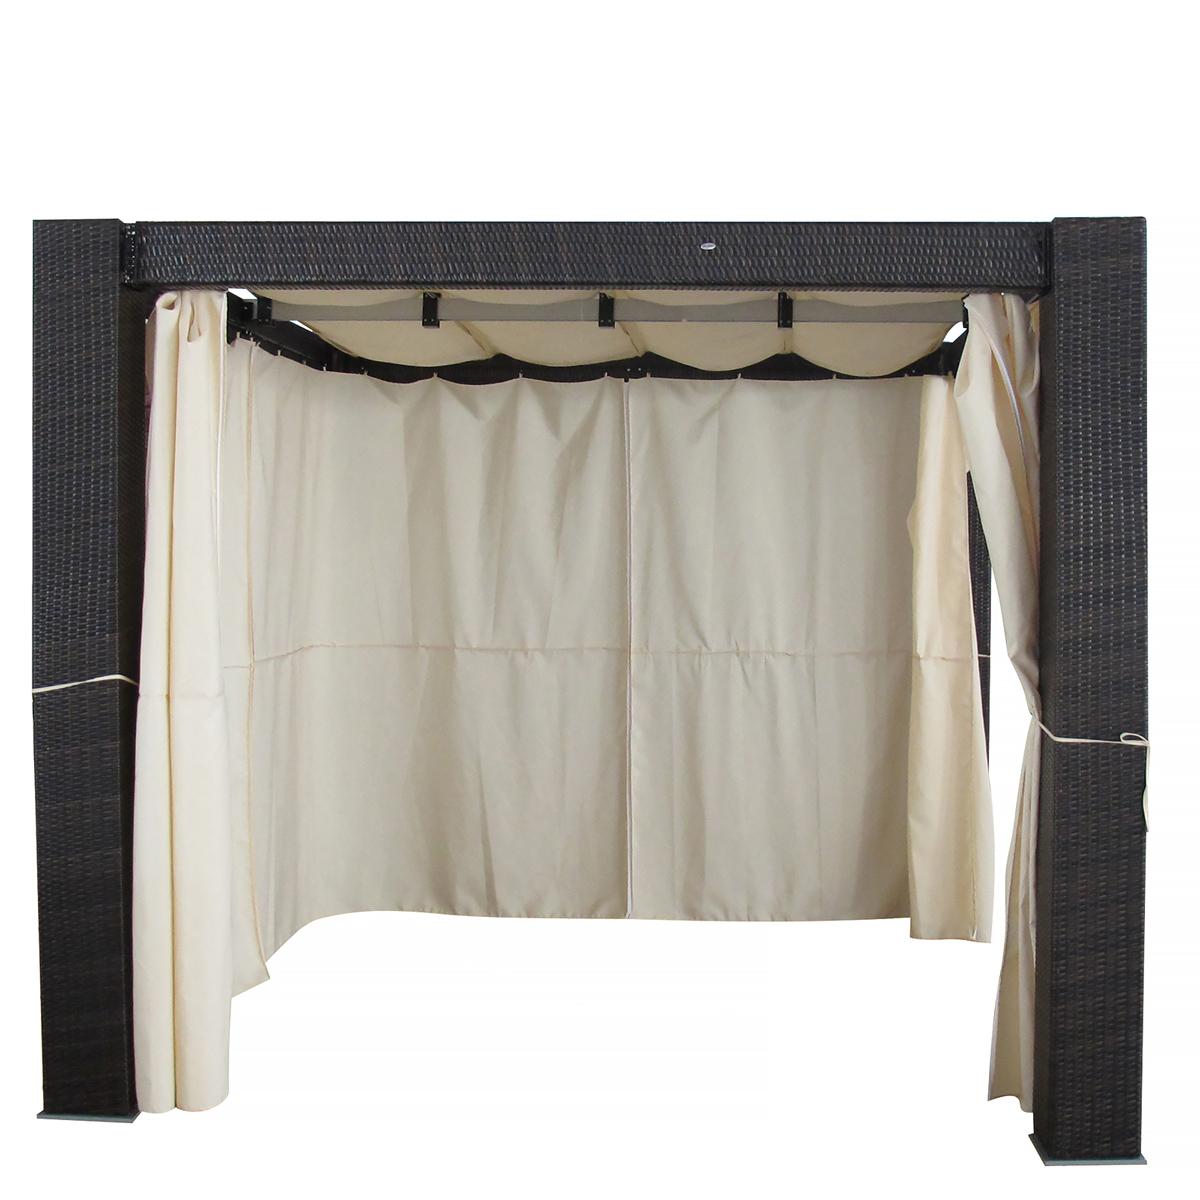 heaven garten rattan gazebo pavillion pergola gartenm bel xxl ebay. Black Bedroom Furniture Sets. Home Design Ideas